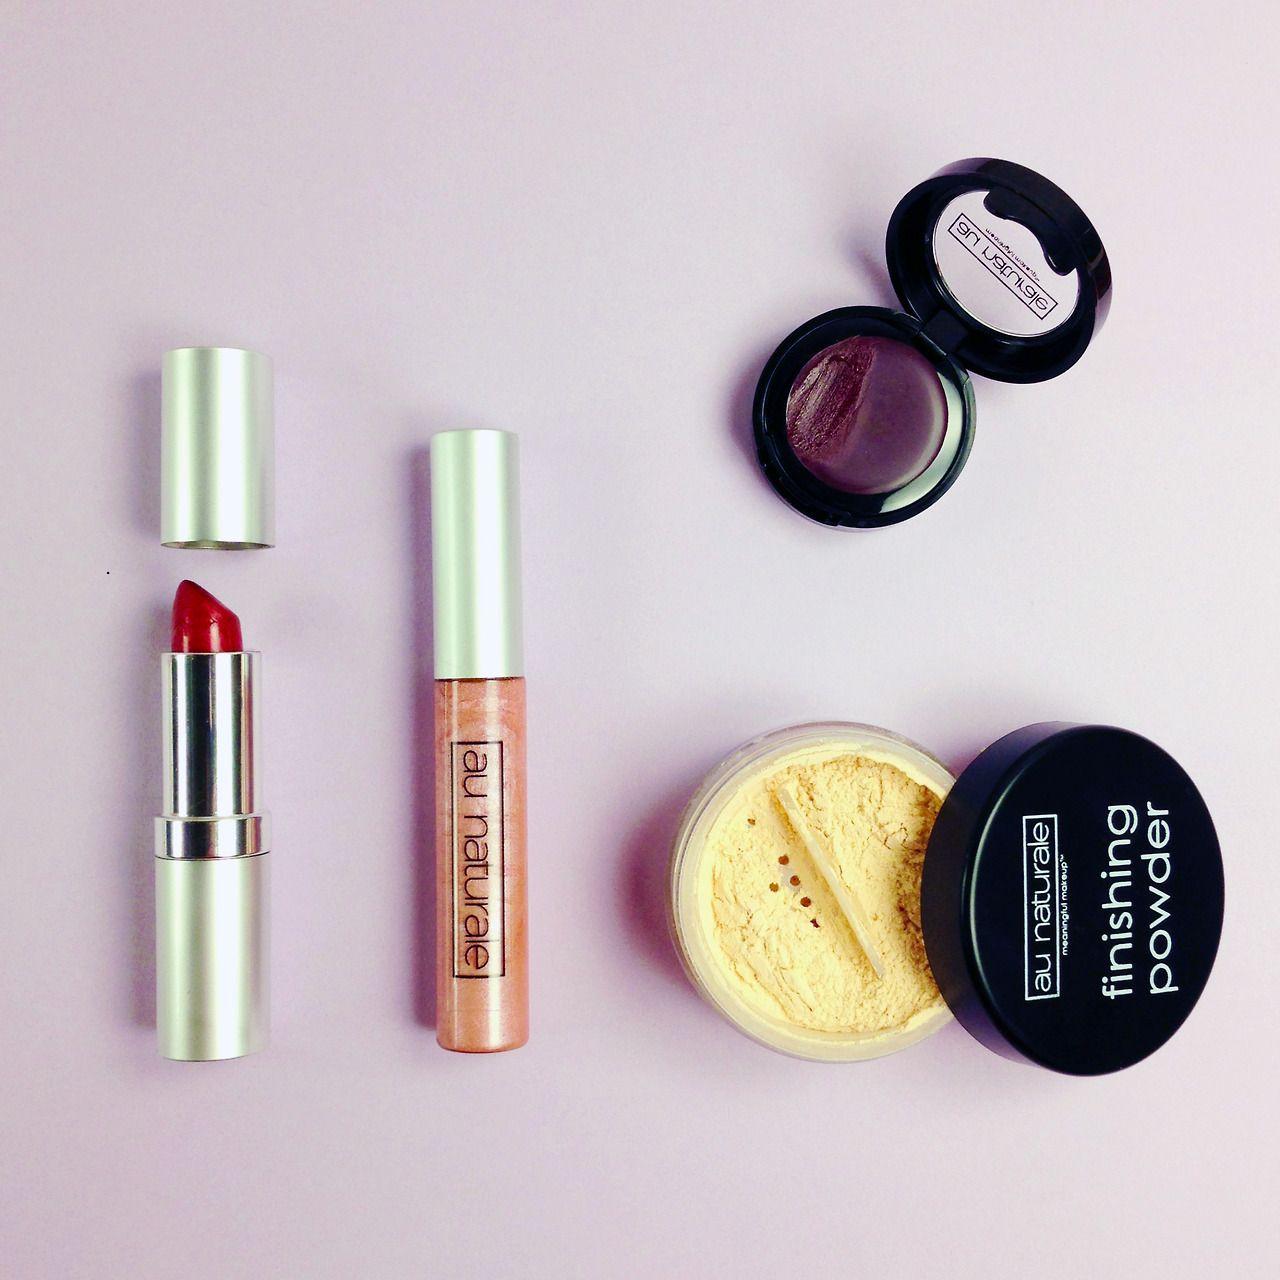 Review of Au Naturale Makeup via Pemberley Jones Your